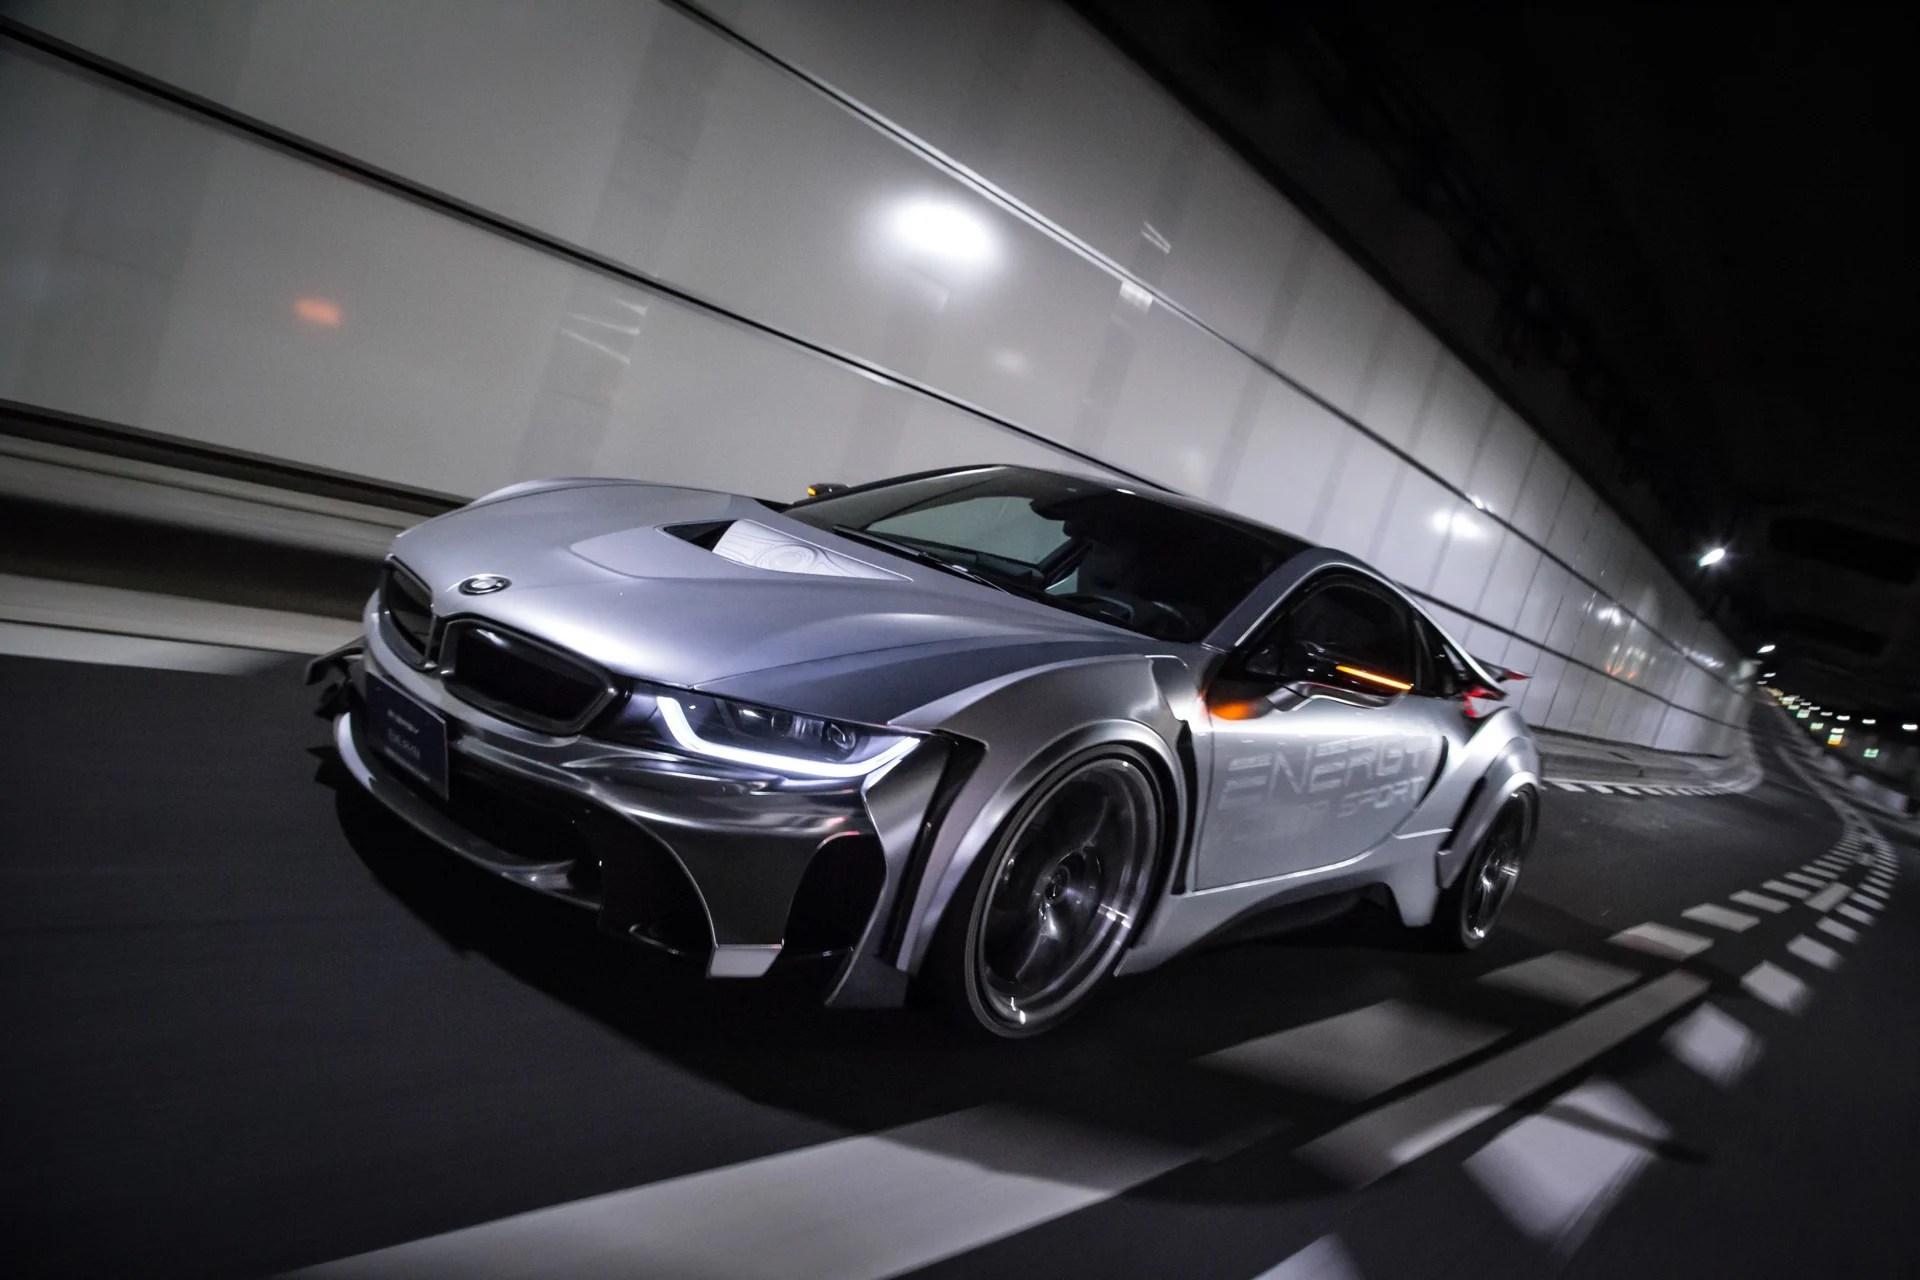 BMW I8 Receives Energy Motor Sport Bodykit Package Paul